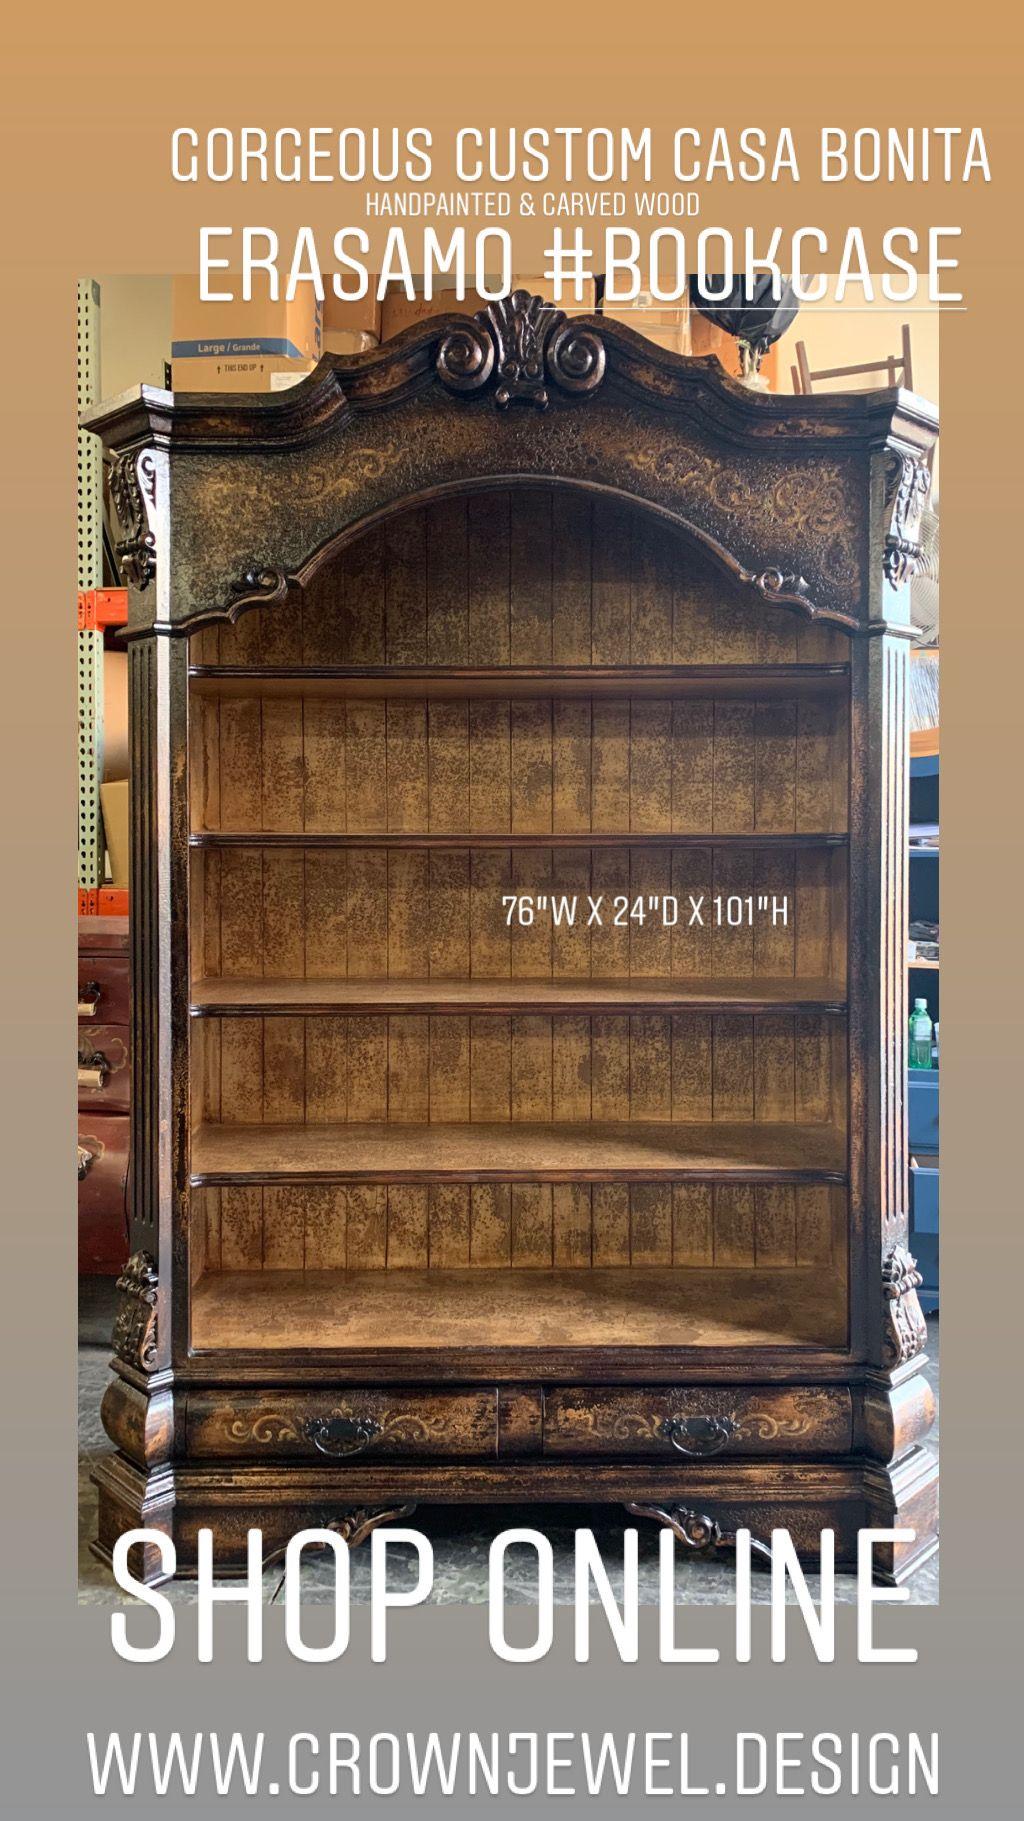 Shop Www Crownjewel Design Casa Bonita Handpainted Handcrafted Wood Bookcases Sir Oliver Candles Caspari Napkins Handcrafted Wood